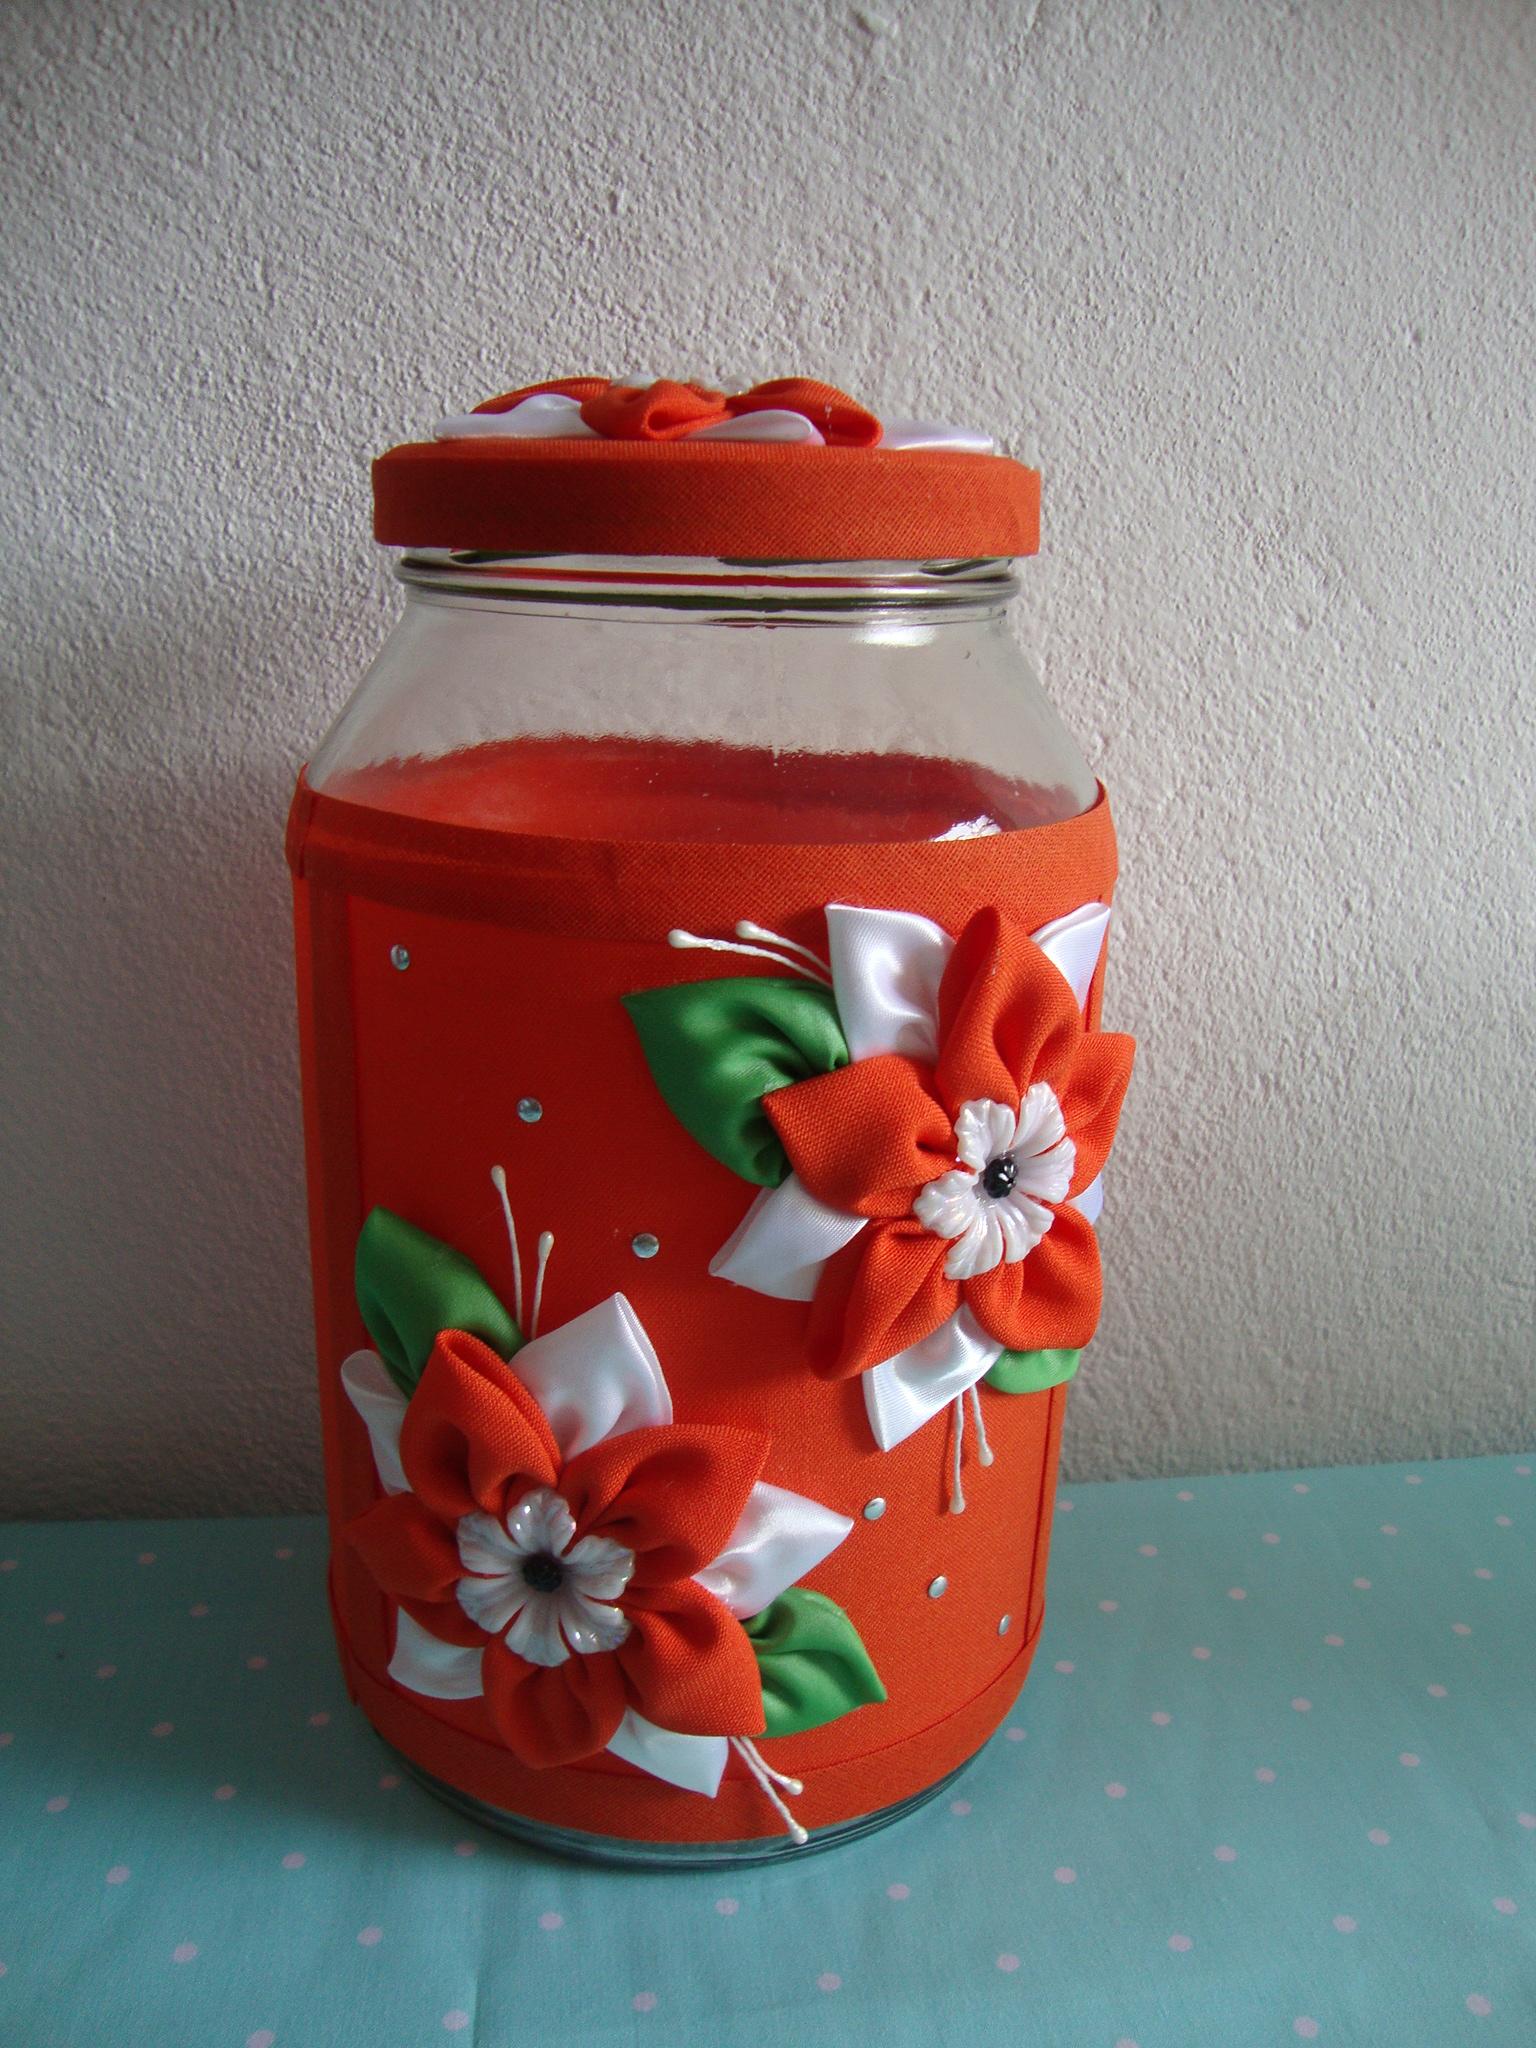 #AE331D Potes de vidros decorados Potes de vidros decorados Potes de vidros 1560 Vidros De Janelas Decorados